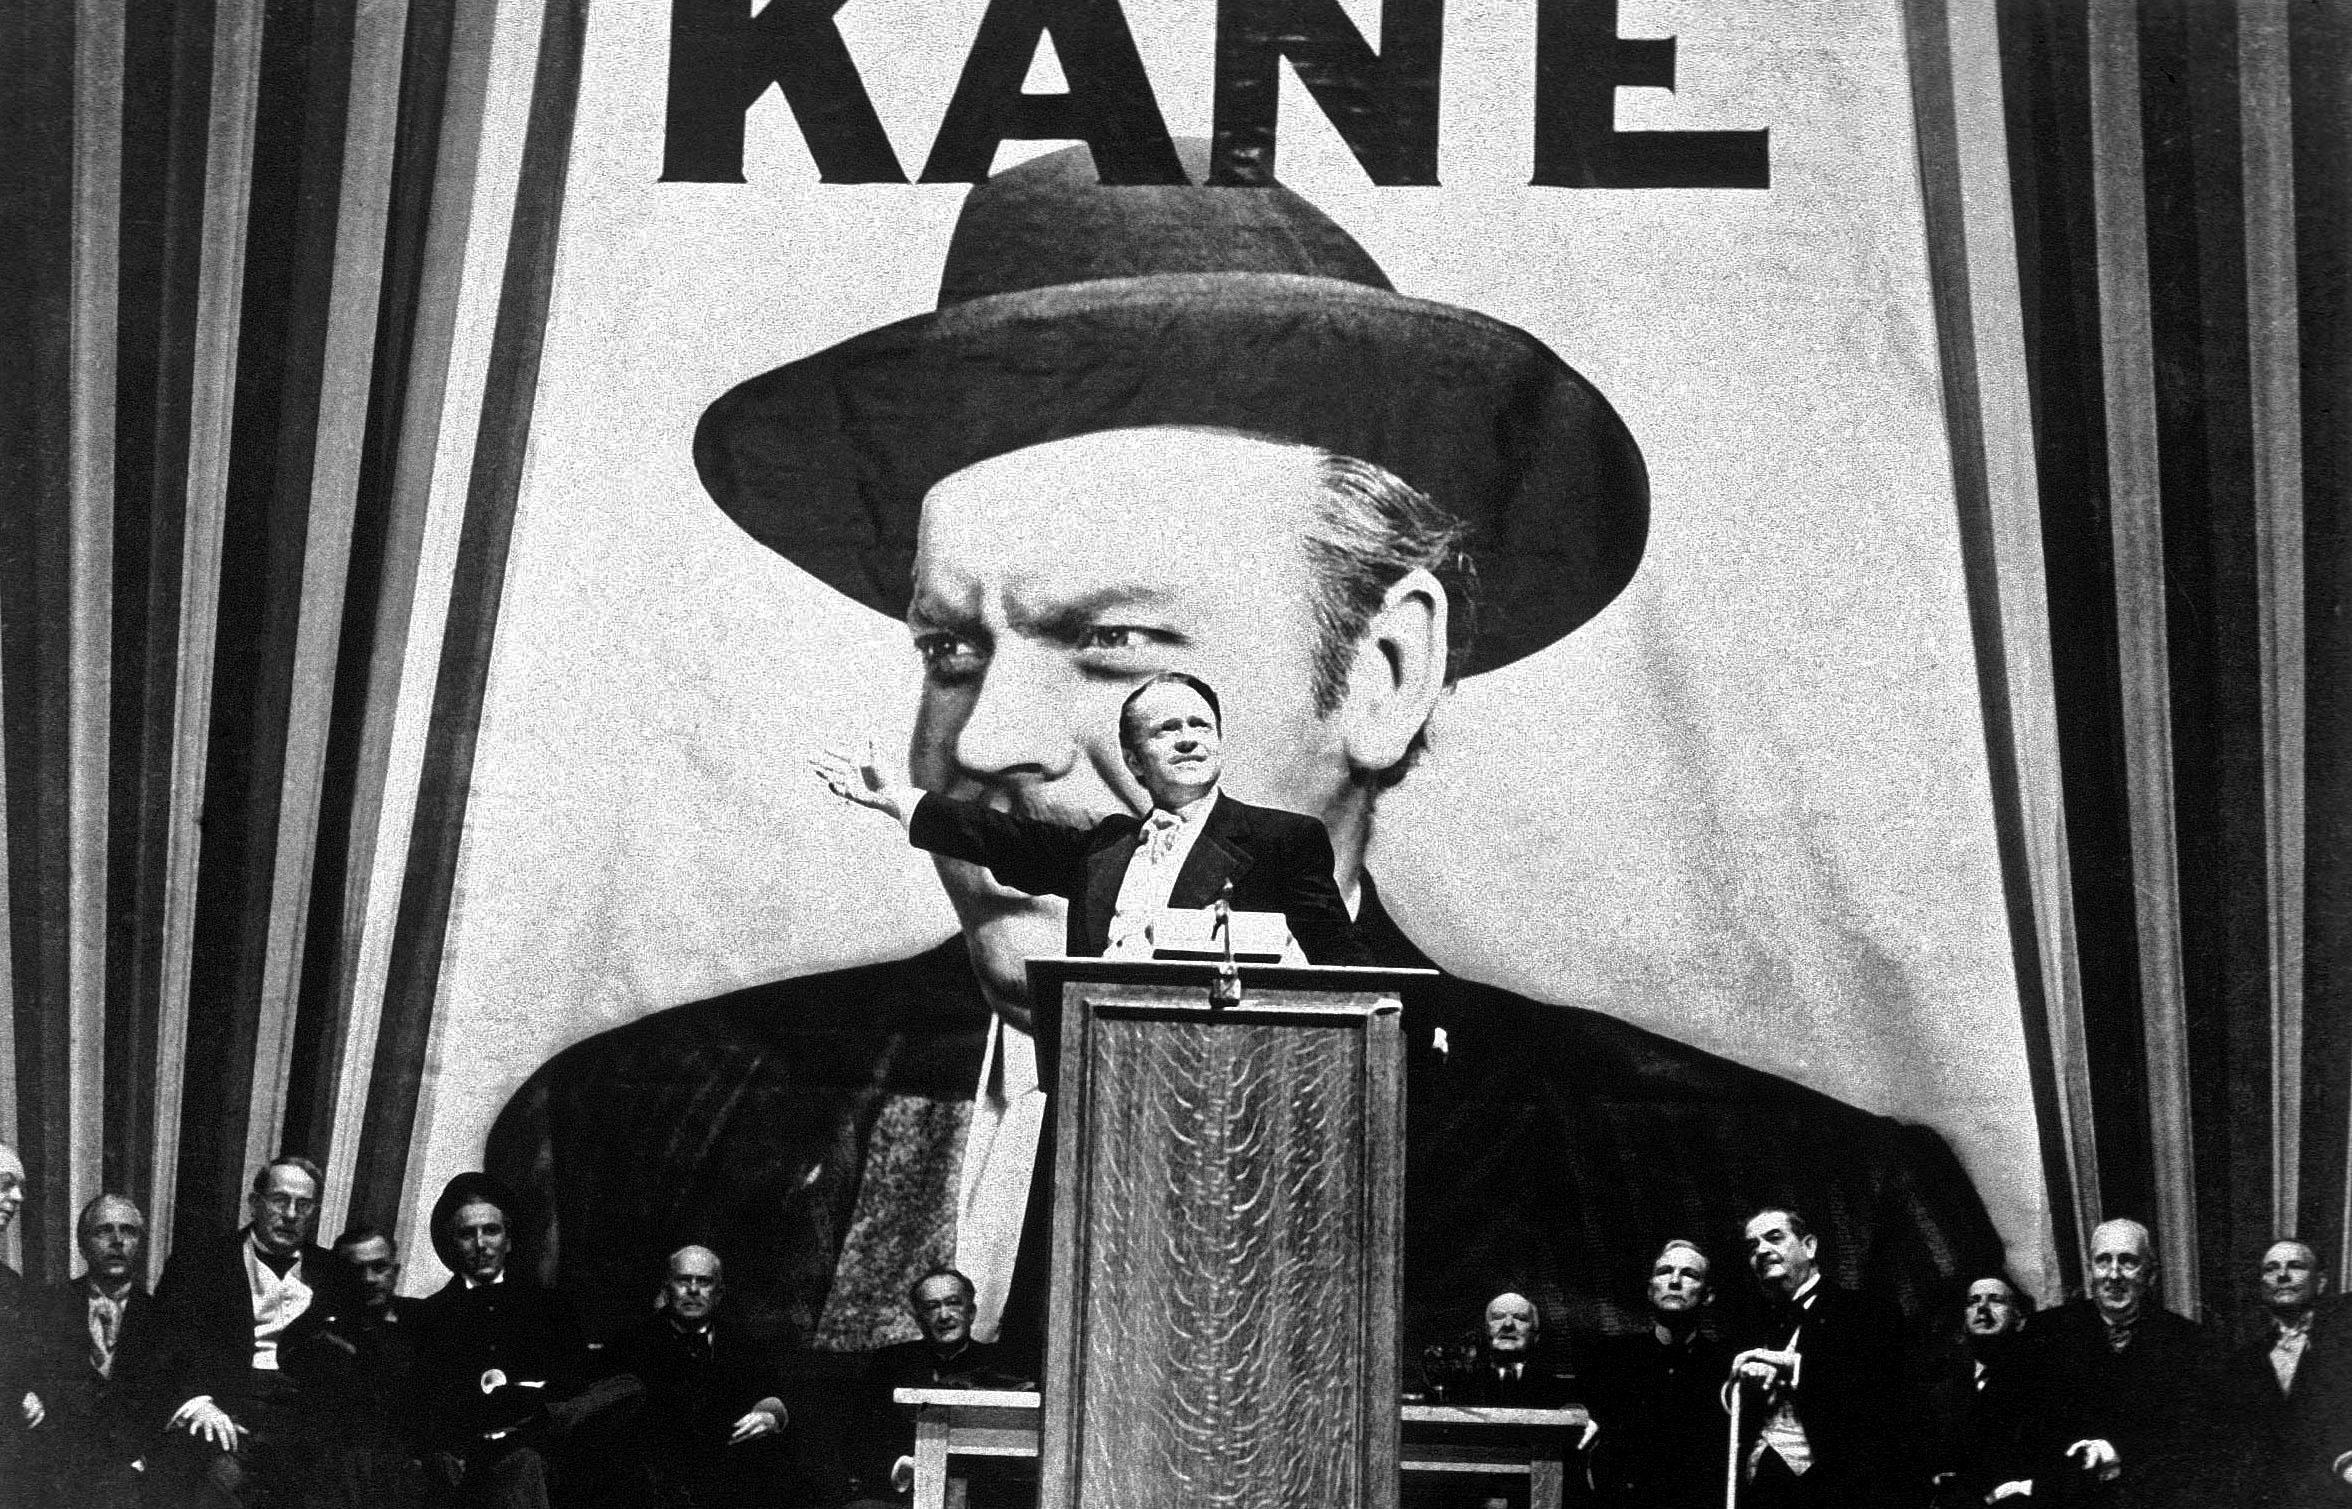 4. Гражданин Кейн Citizen Kane (1941), оператор Грегг Толанд(режиссер Орсон Уэллс)